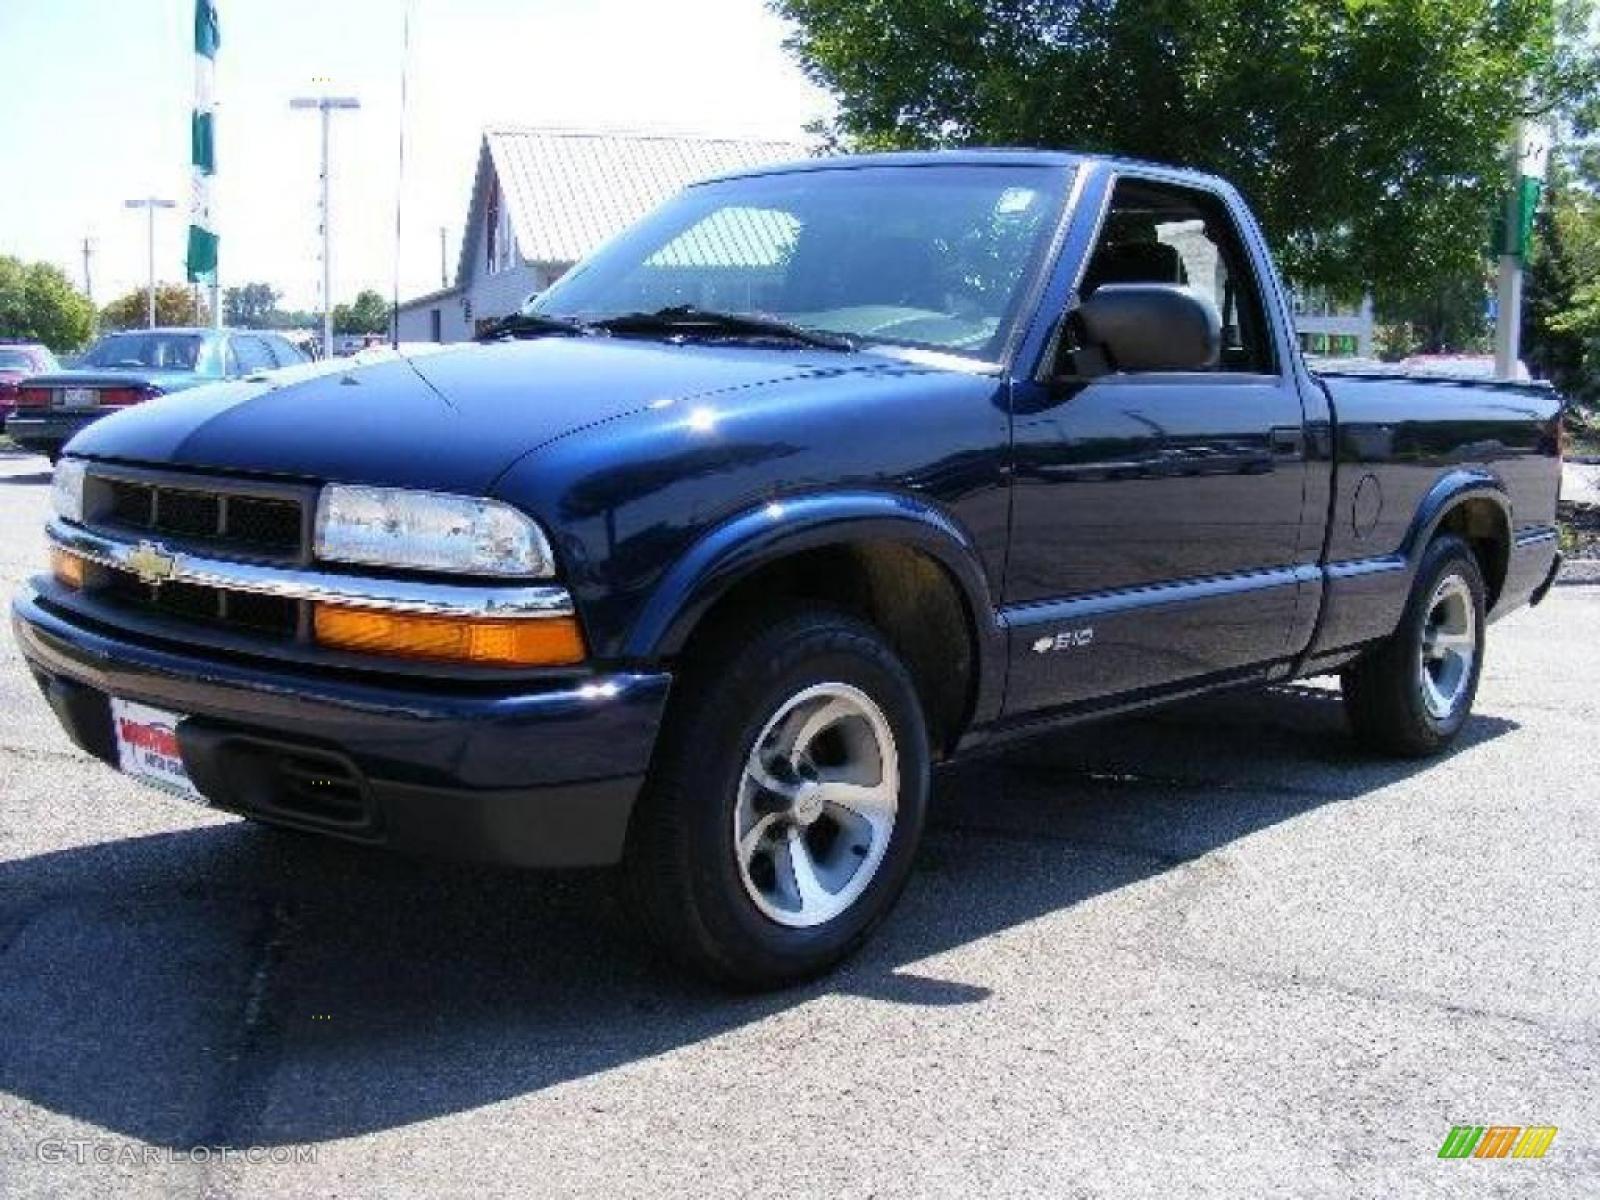 2003 Chevrolet S 10 Information And Photos Zombiedrive Gm 1500 Vacuum Diagram 800 1024 1280 1600 Origin